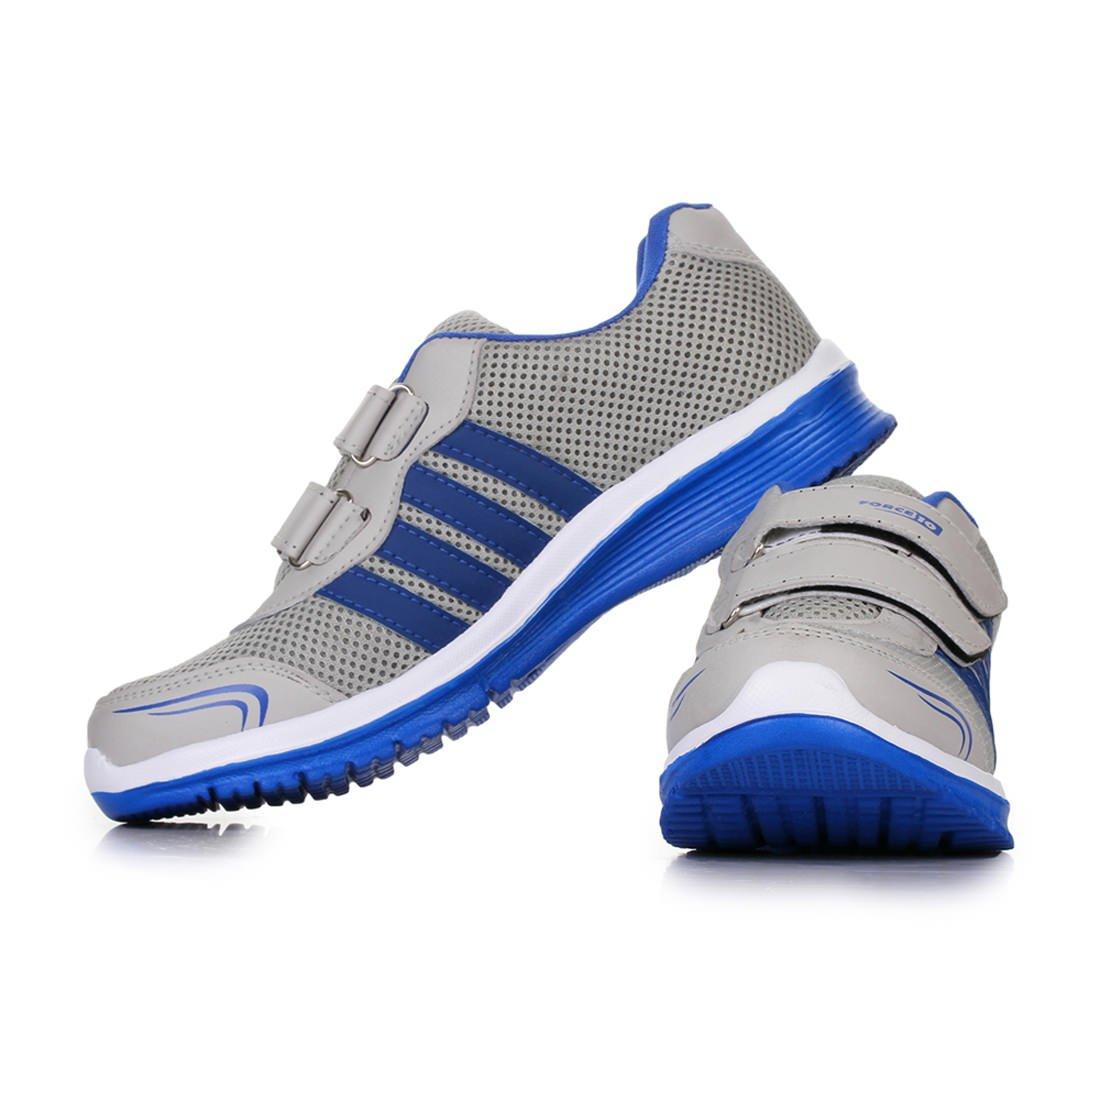 2d2ea3ae0 Force 10 By Liberty Women s Grey Running Shoes-4 UK India (37 EU)  (5004656102370)  Amazon.in  Shoes   Handbags